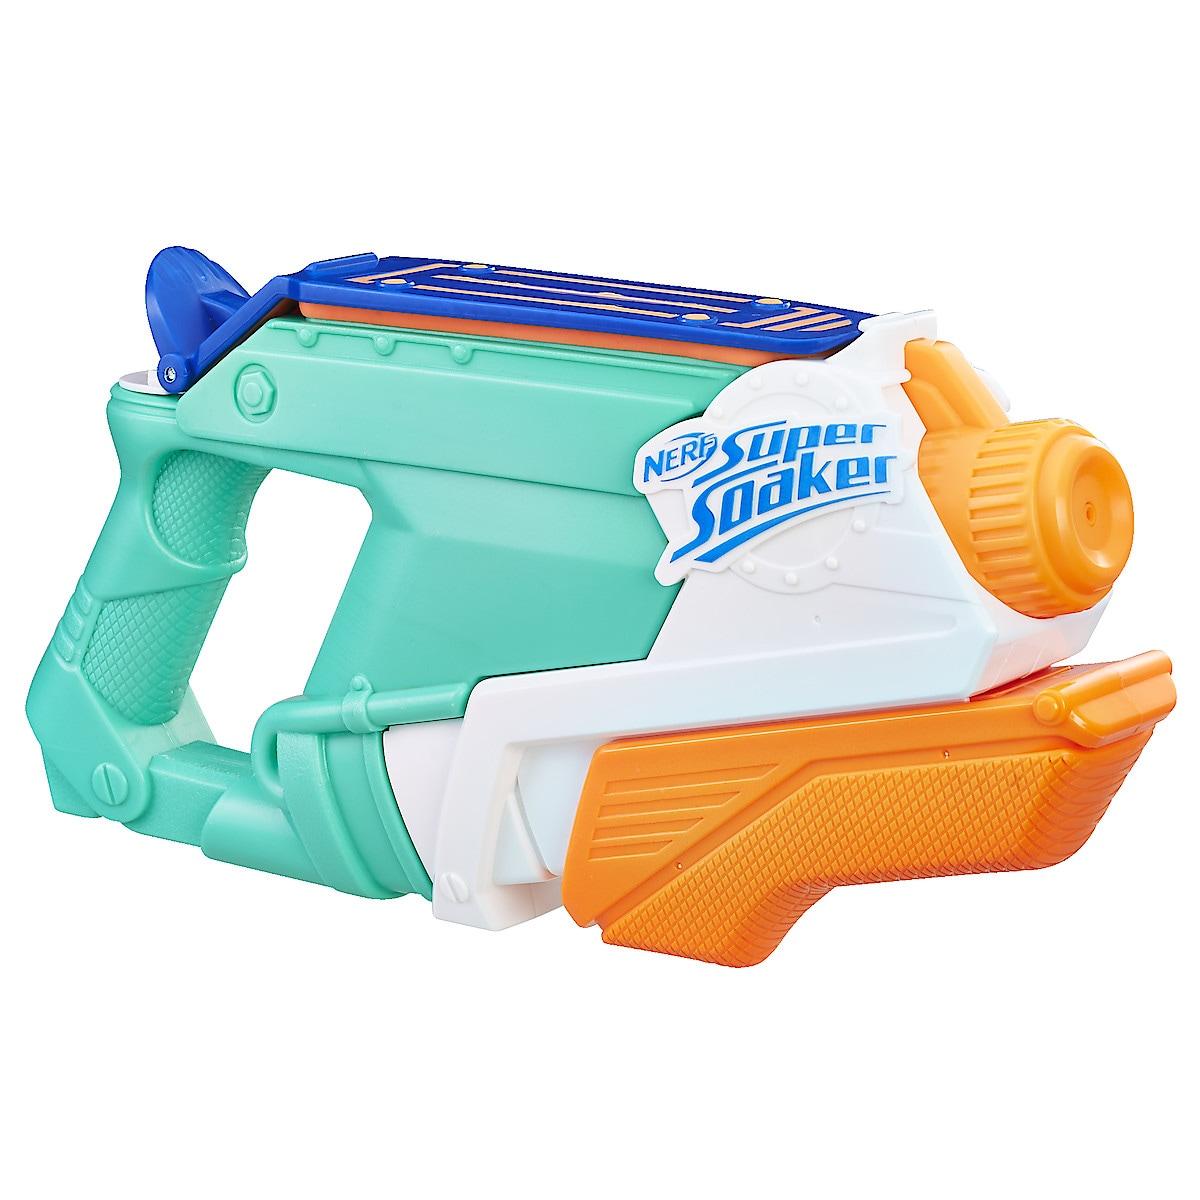 Nerf Super Soaker Splash Mouth vannpistol